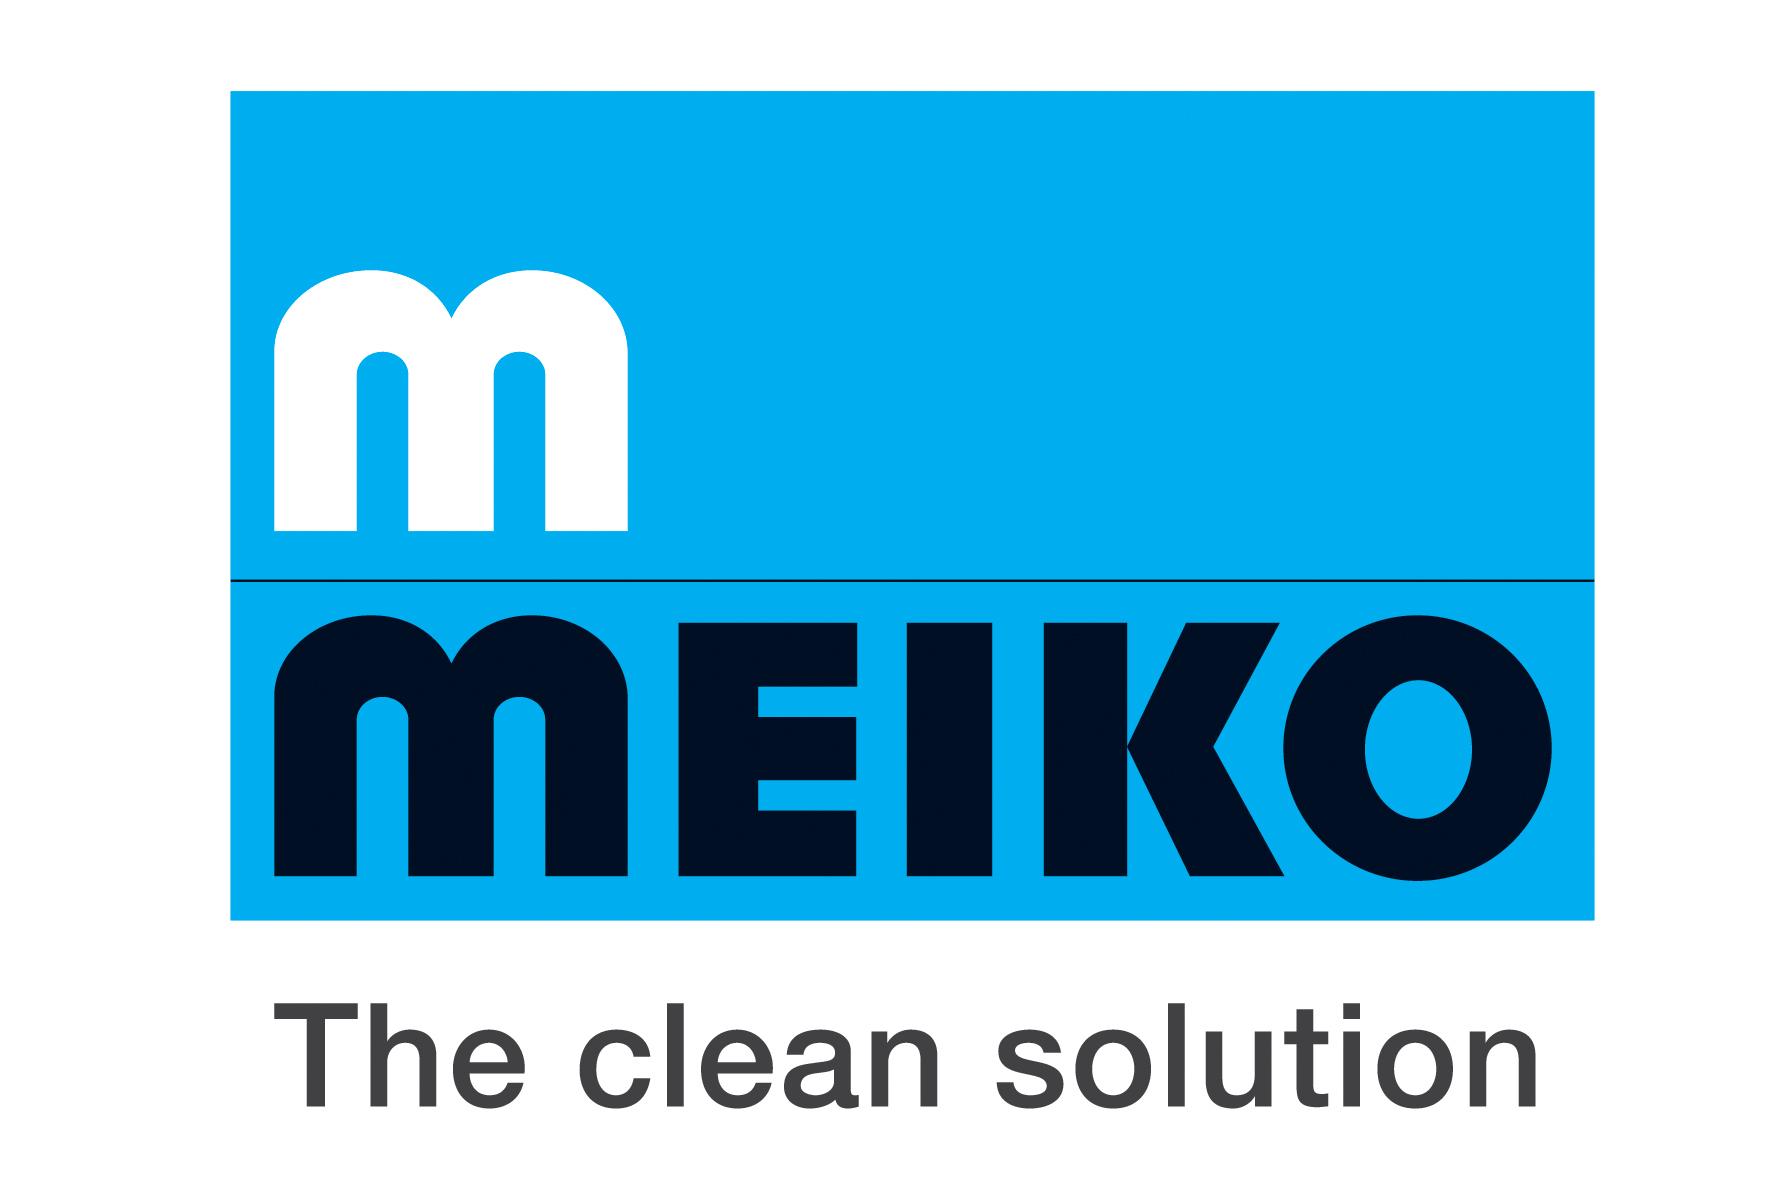 meiko_logo_the_clean_solution-01